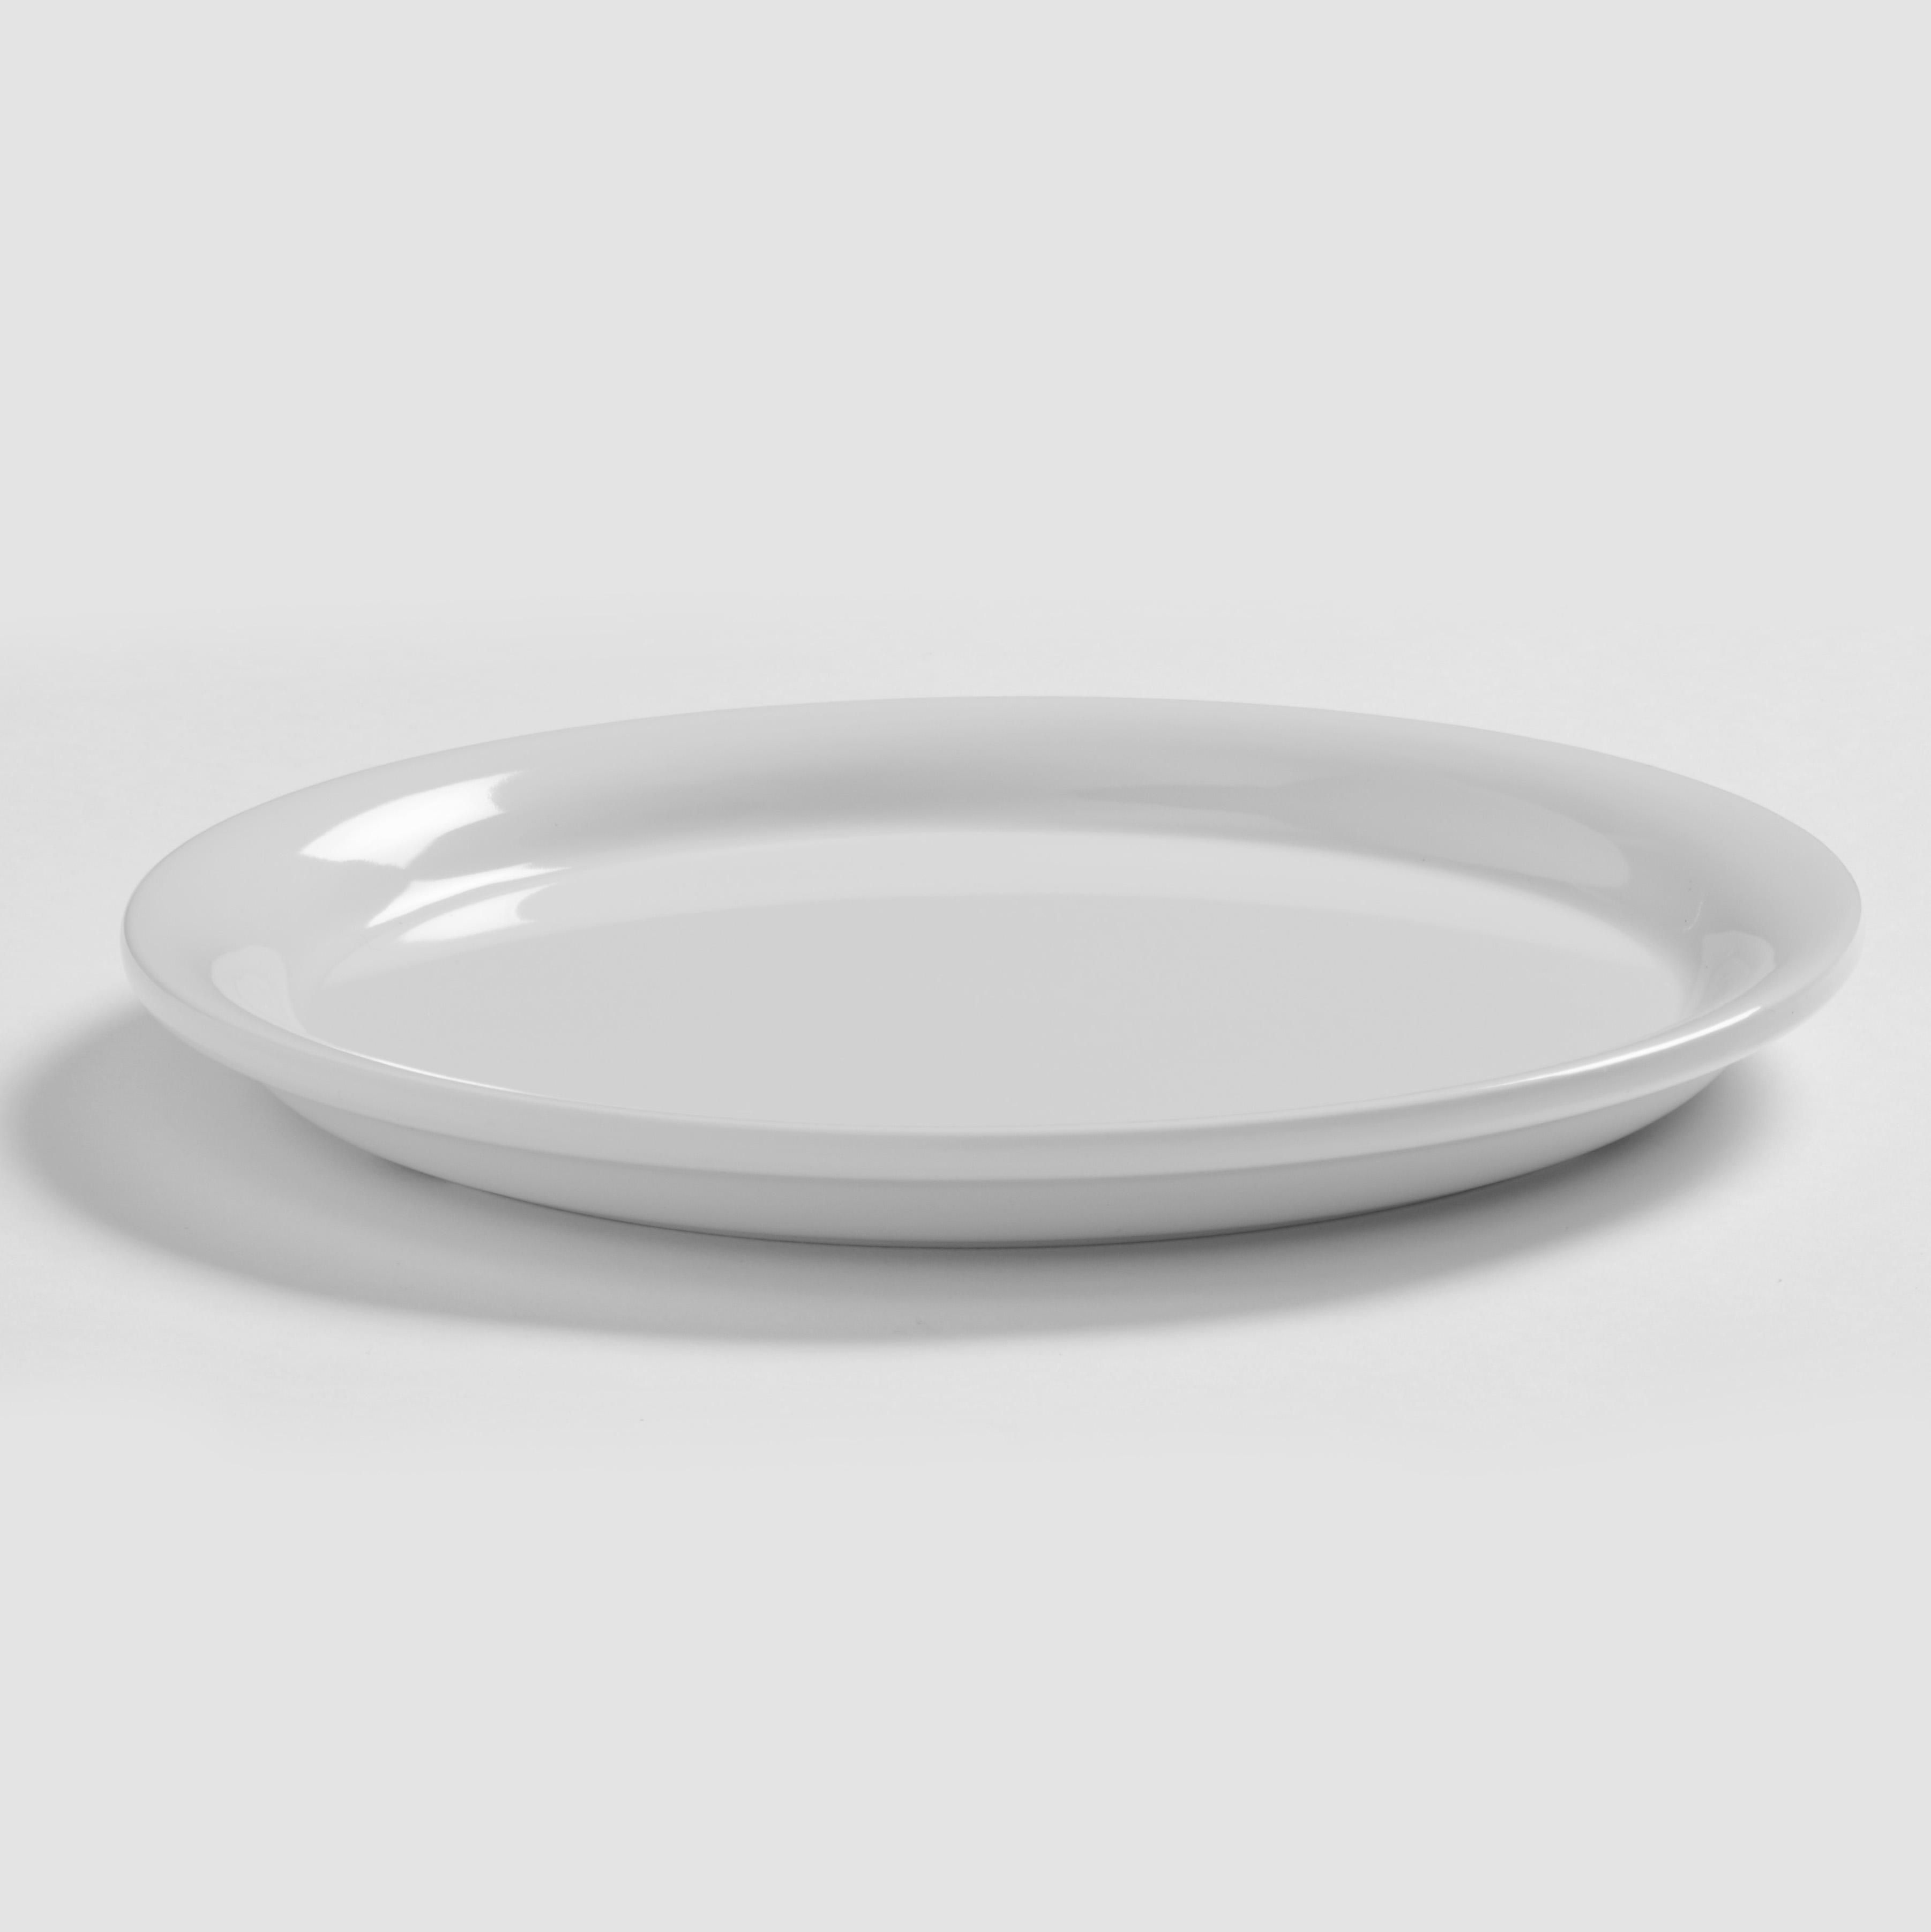 American Metalcraft DPN6WH plate, plastic